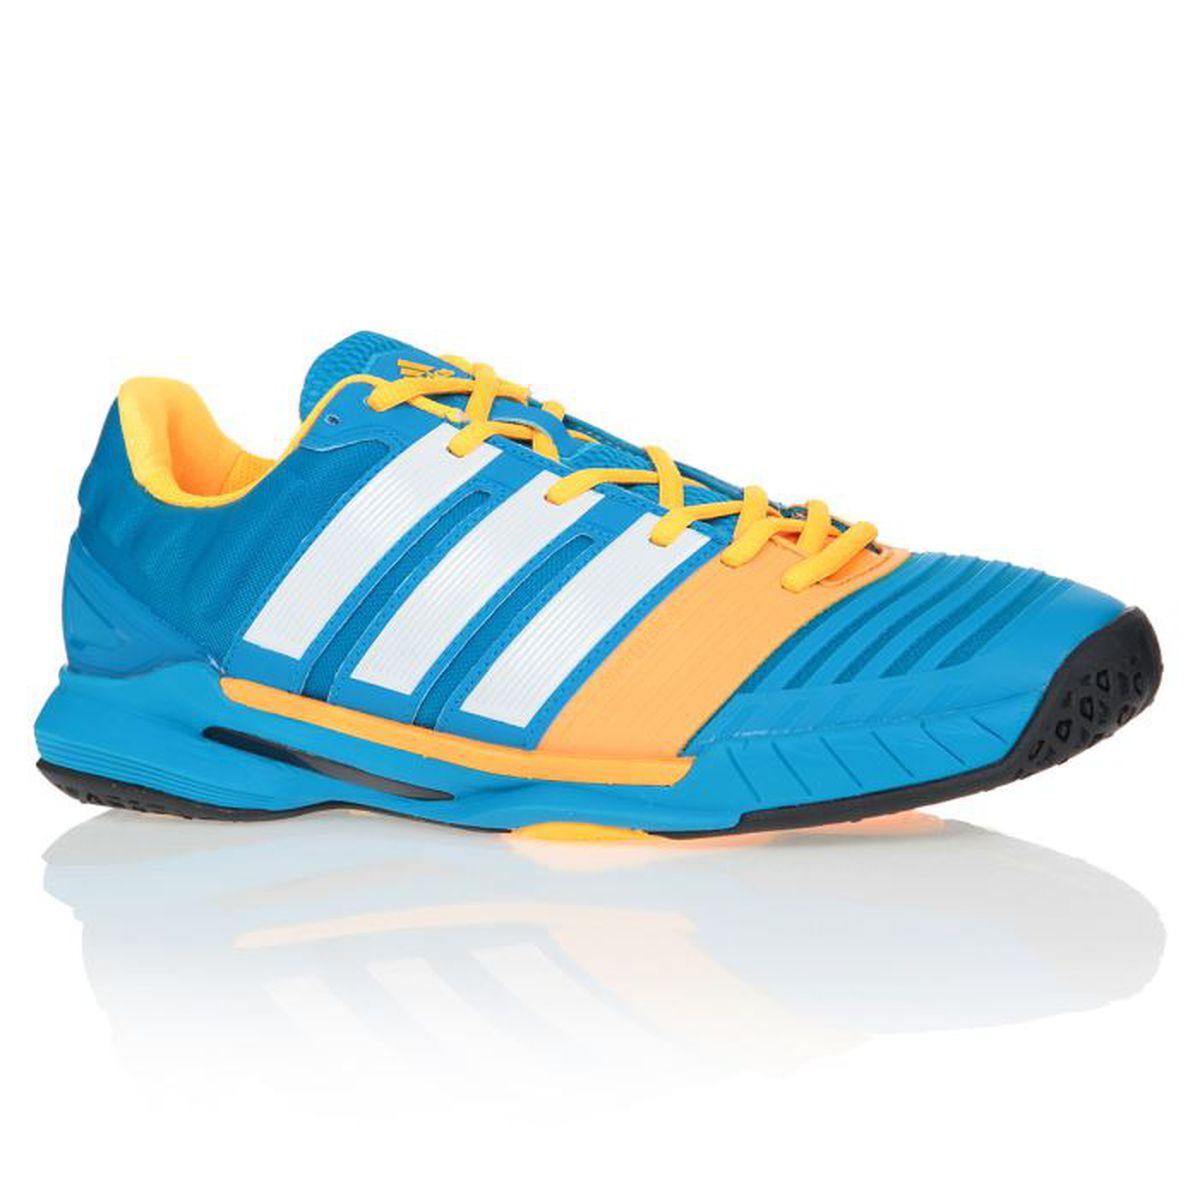 adidas Performance STABIL ESSENCE - Chaussures de handball - orange/blue e9xVjKU